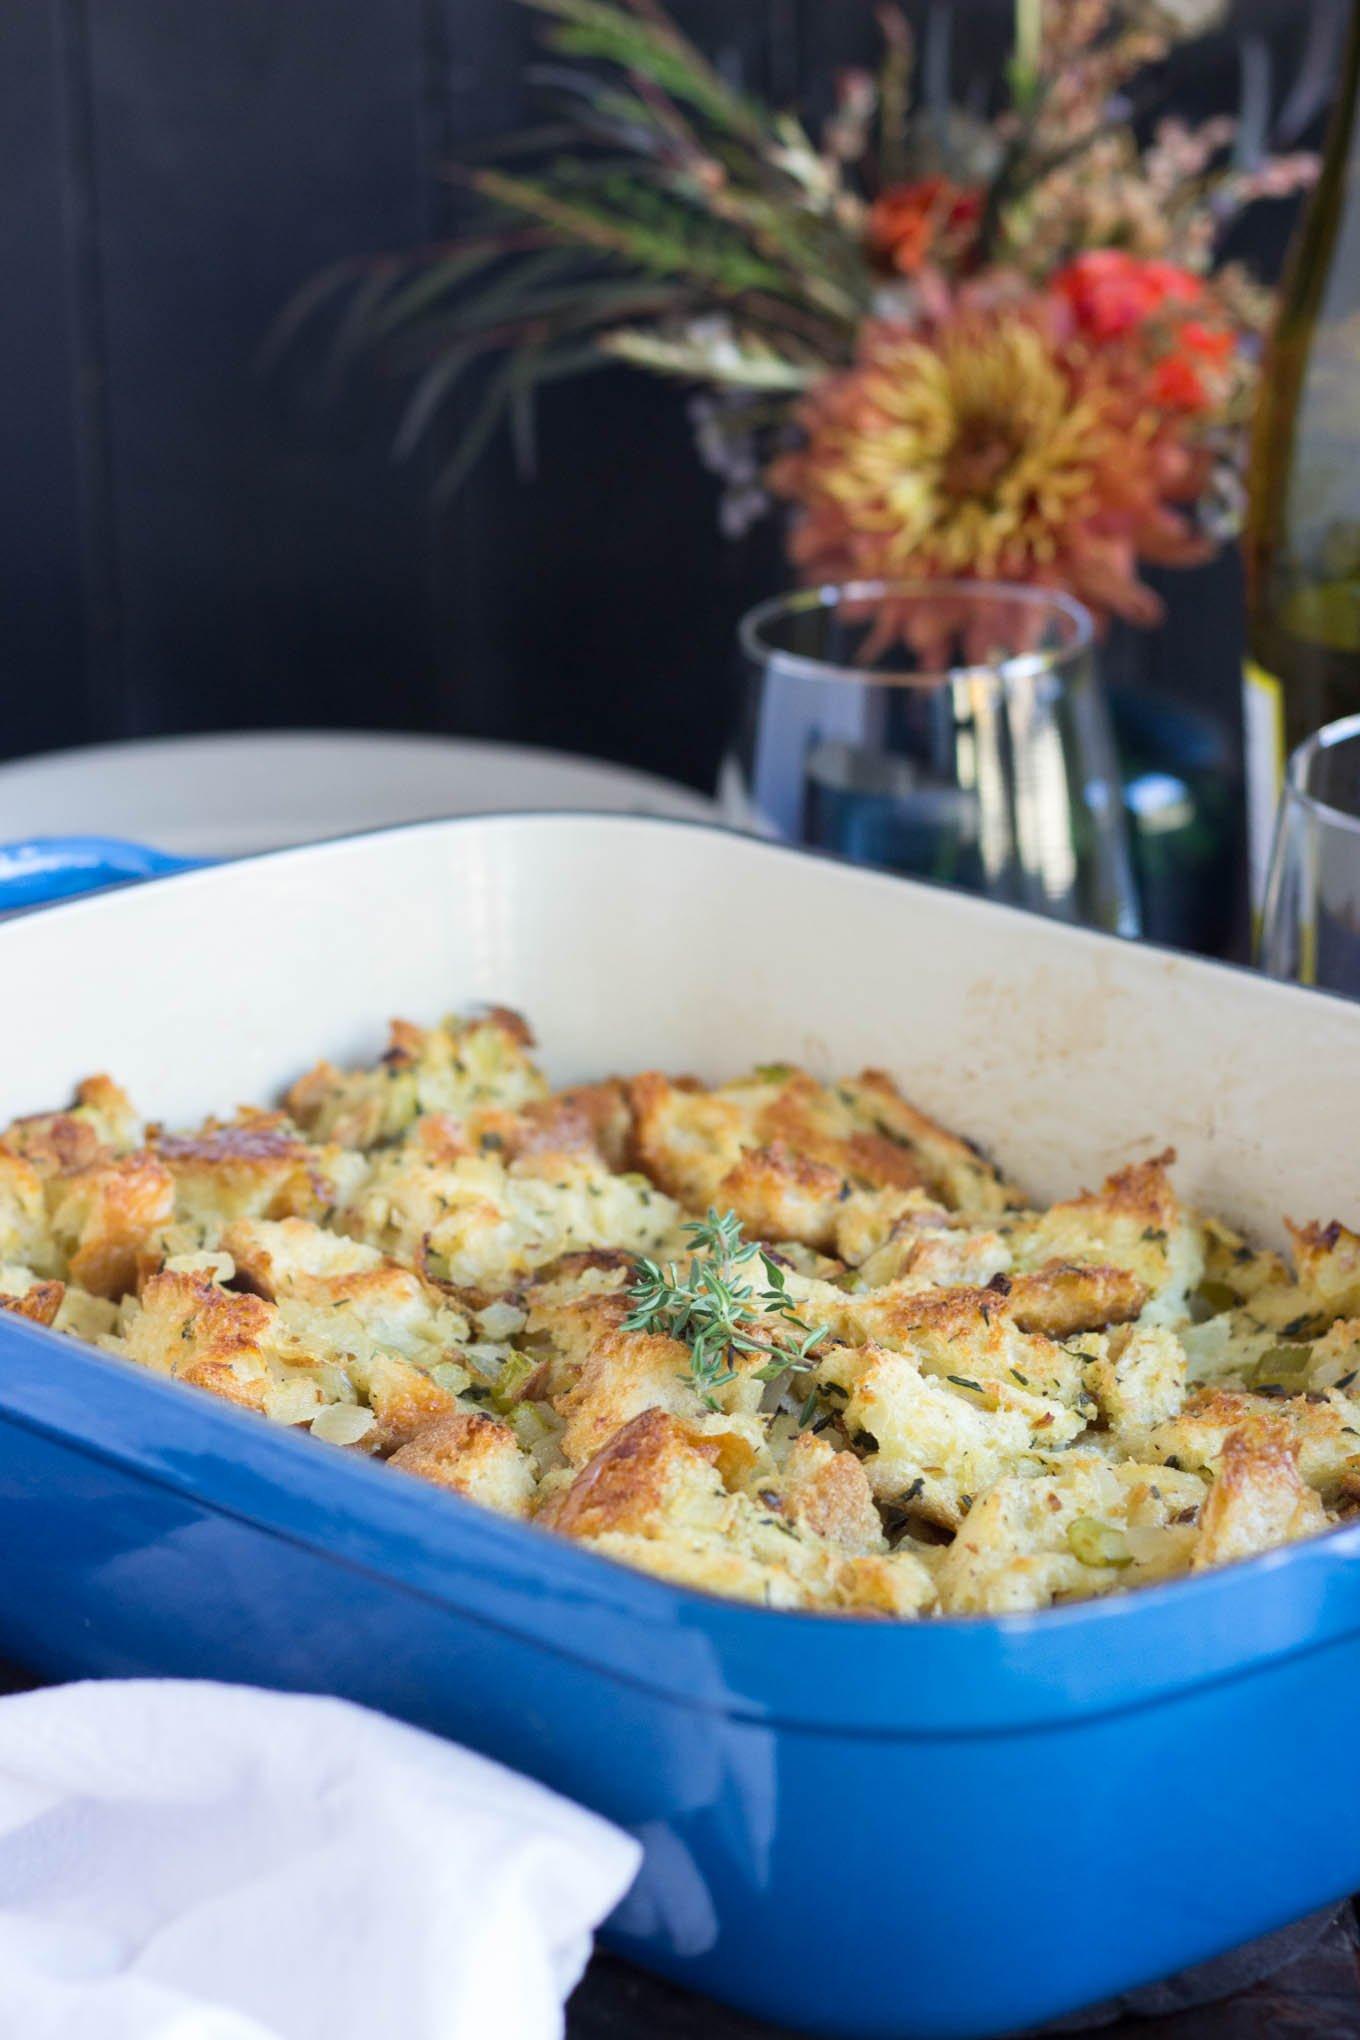 Vegetarian Herbed Stuffing/Dressing in blue casserole dish